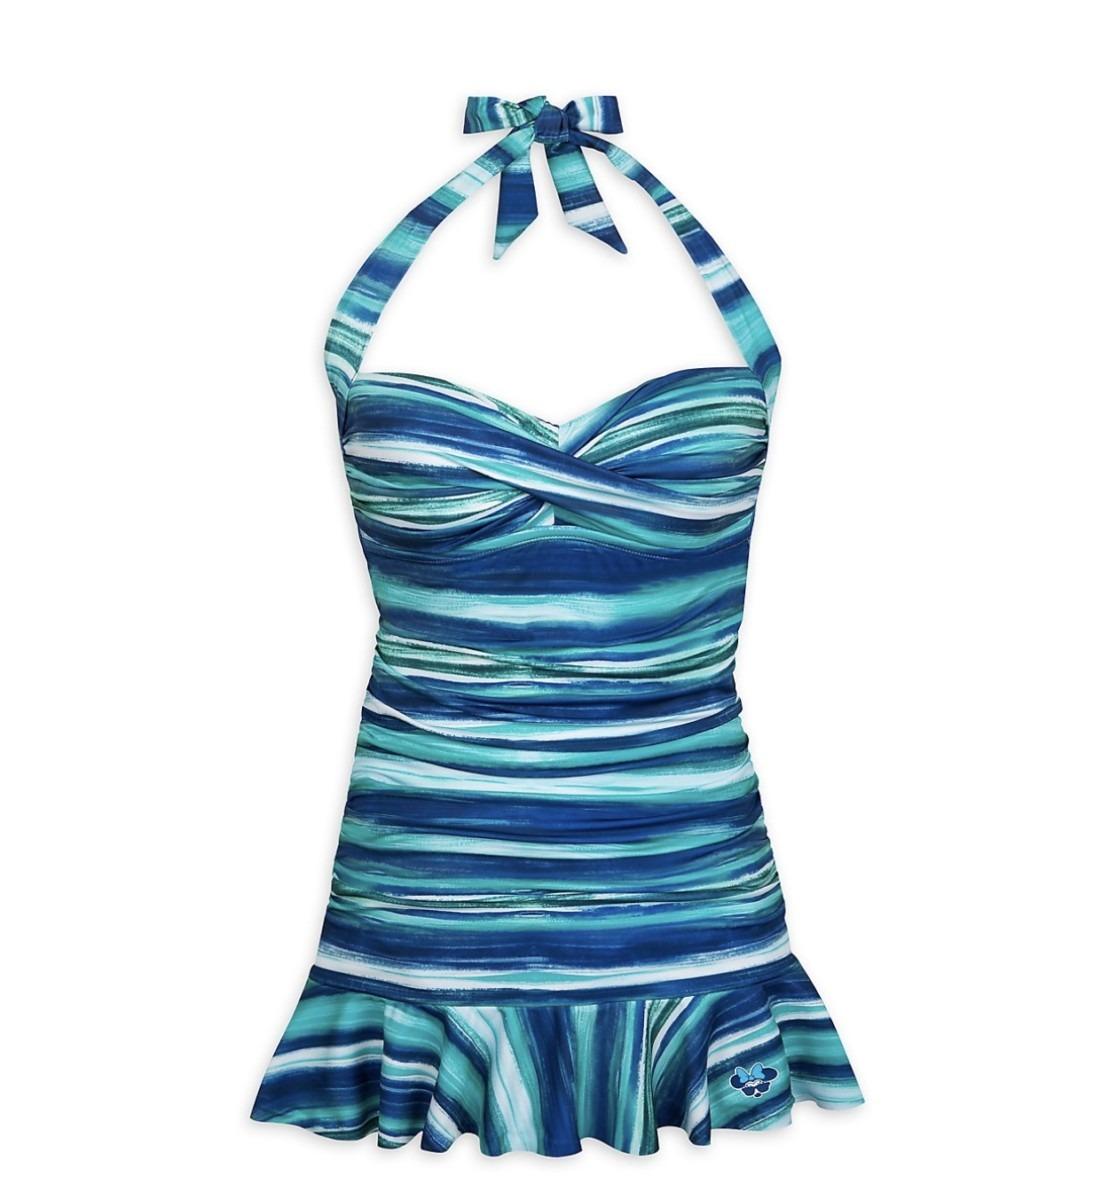 Summer Fun Swim Essentials from shopDisney 2